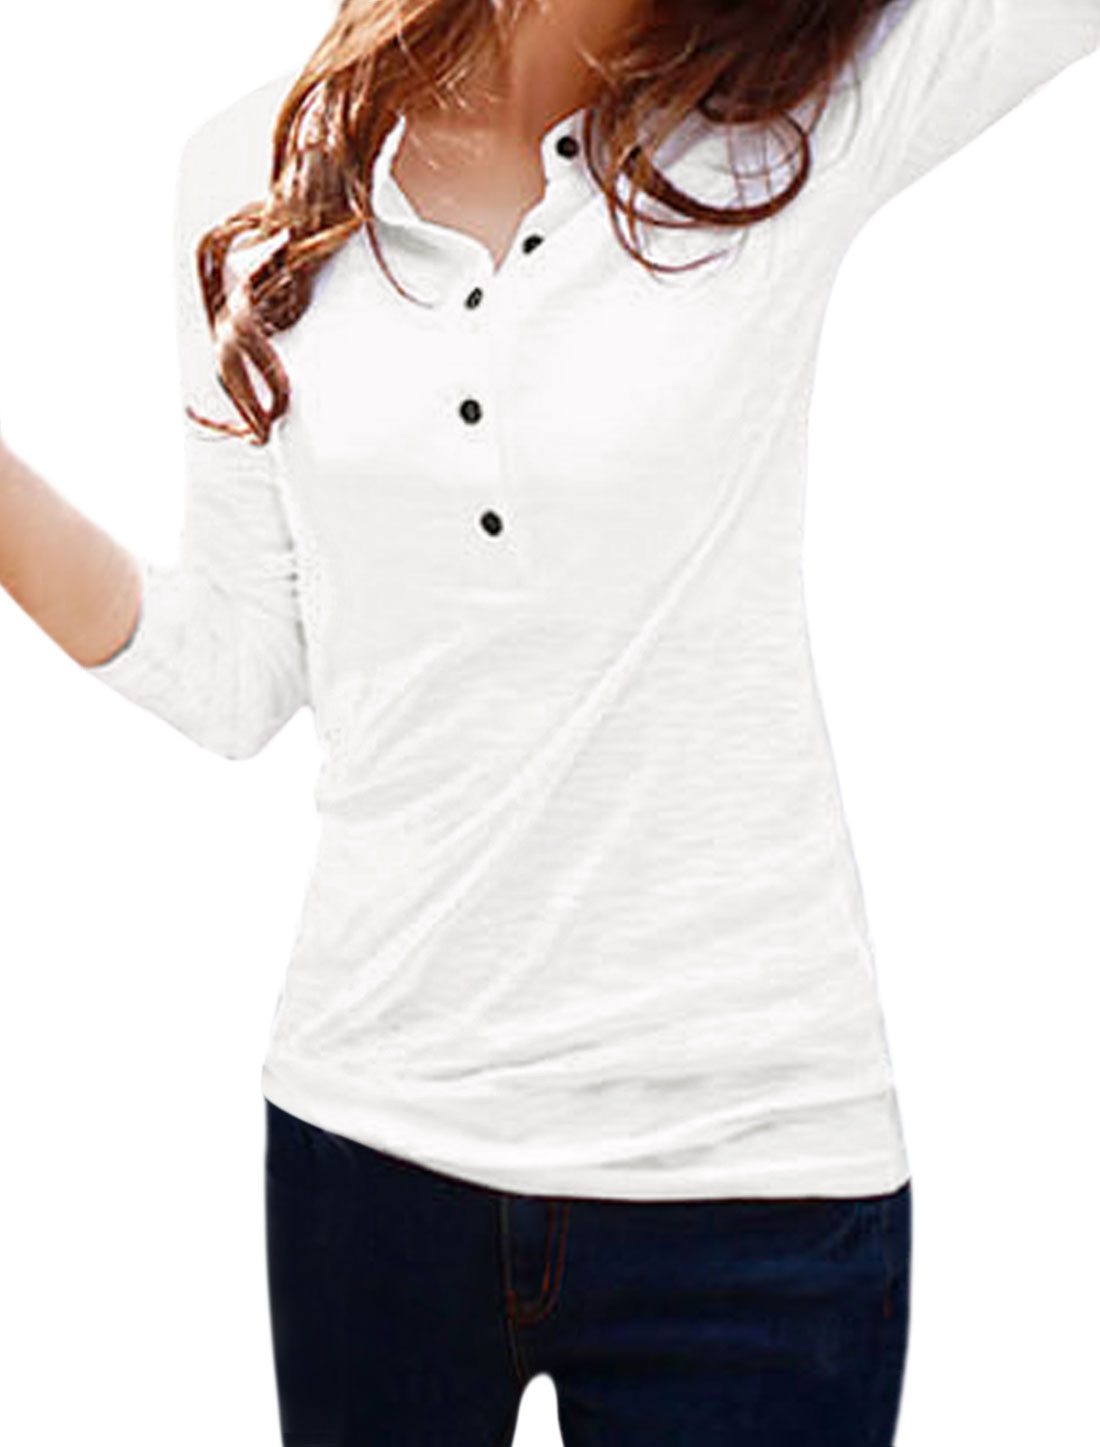 Women Long Sleeves Stand Collar Half Placket Tee Shirt White S